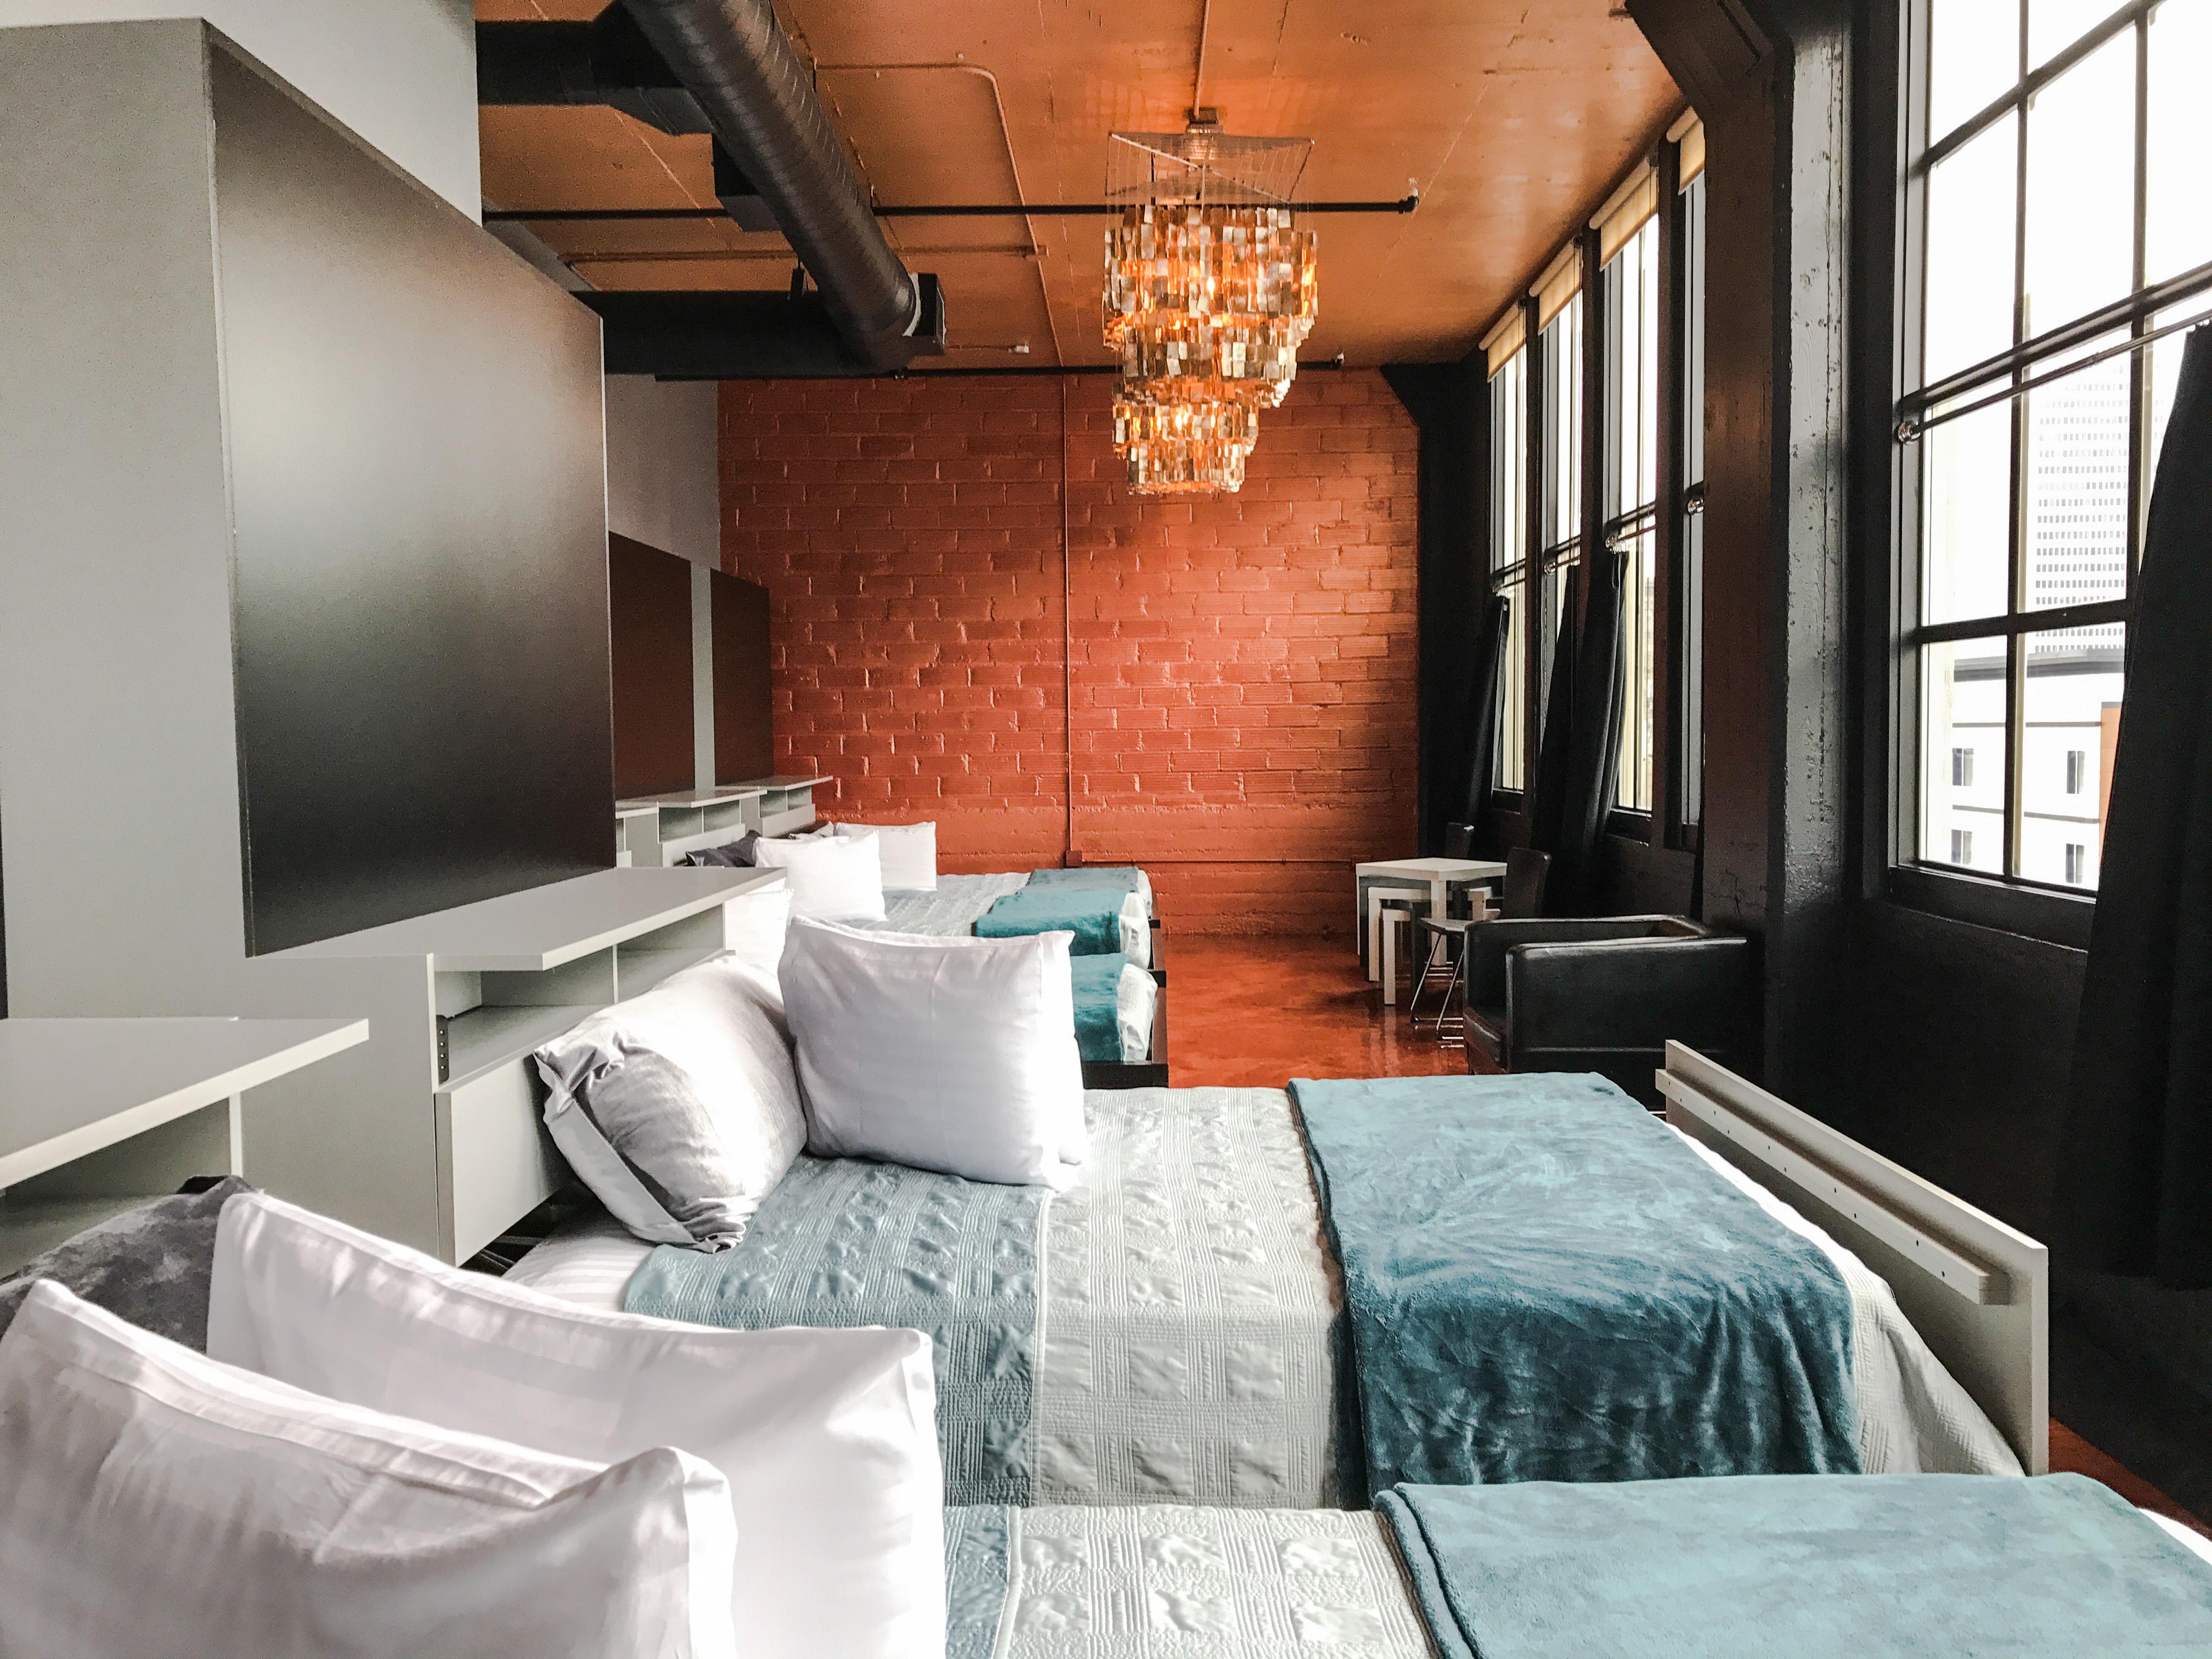 Loft Reverie Hotel 714+715 - Sleeping 714 + Zbeds + Queen Memory Foam